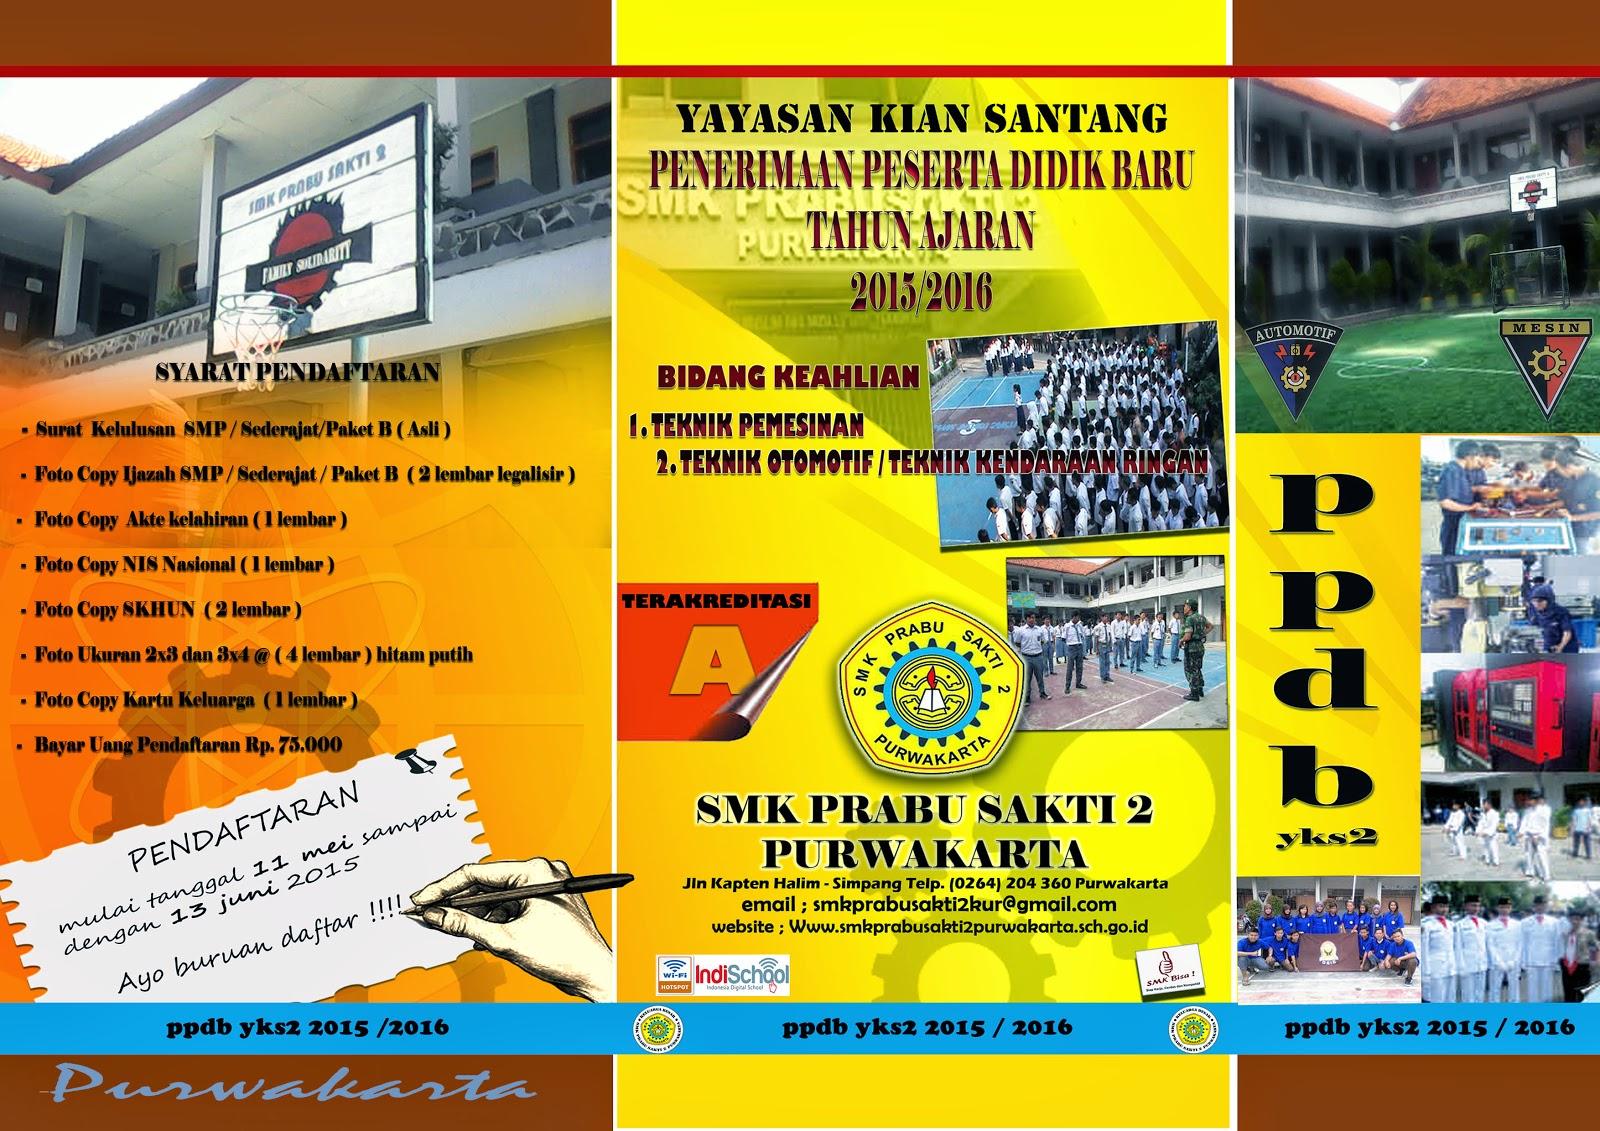 ppdb Smk Prabu Sakti 2 Purwakarta tahun ajaran 2015/2016